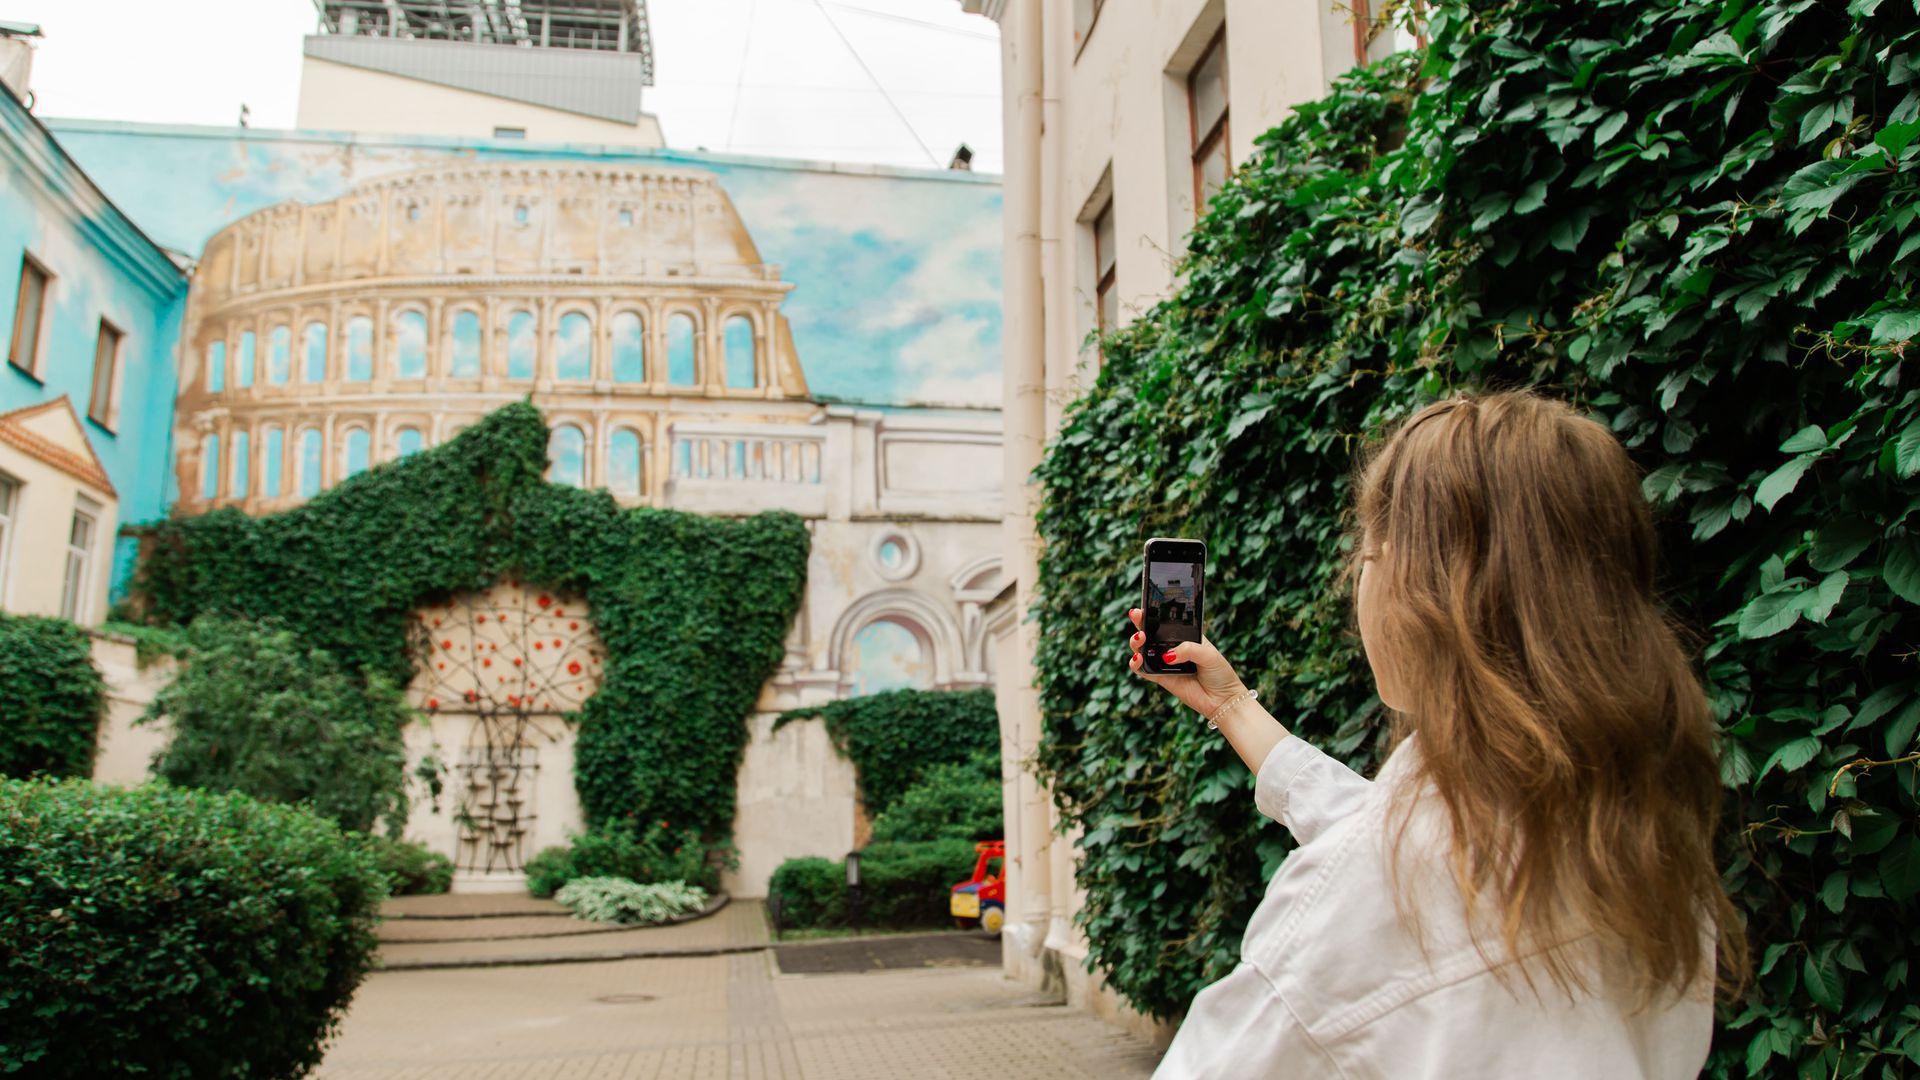 Прогулка по Петербургу: архитектура, стрит-арт и кофе